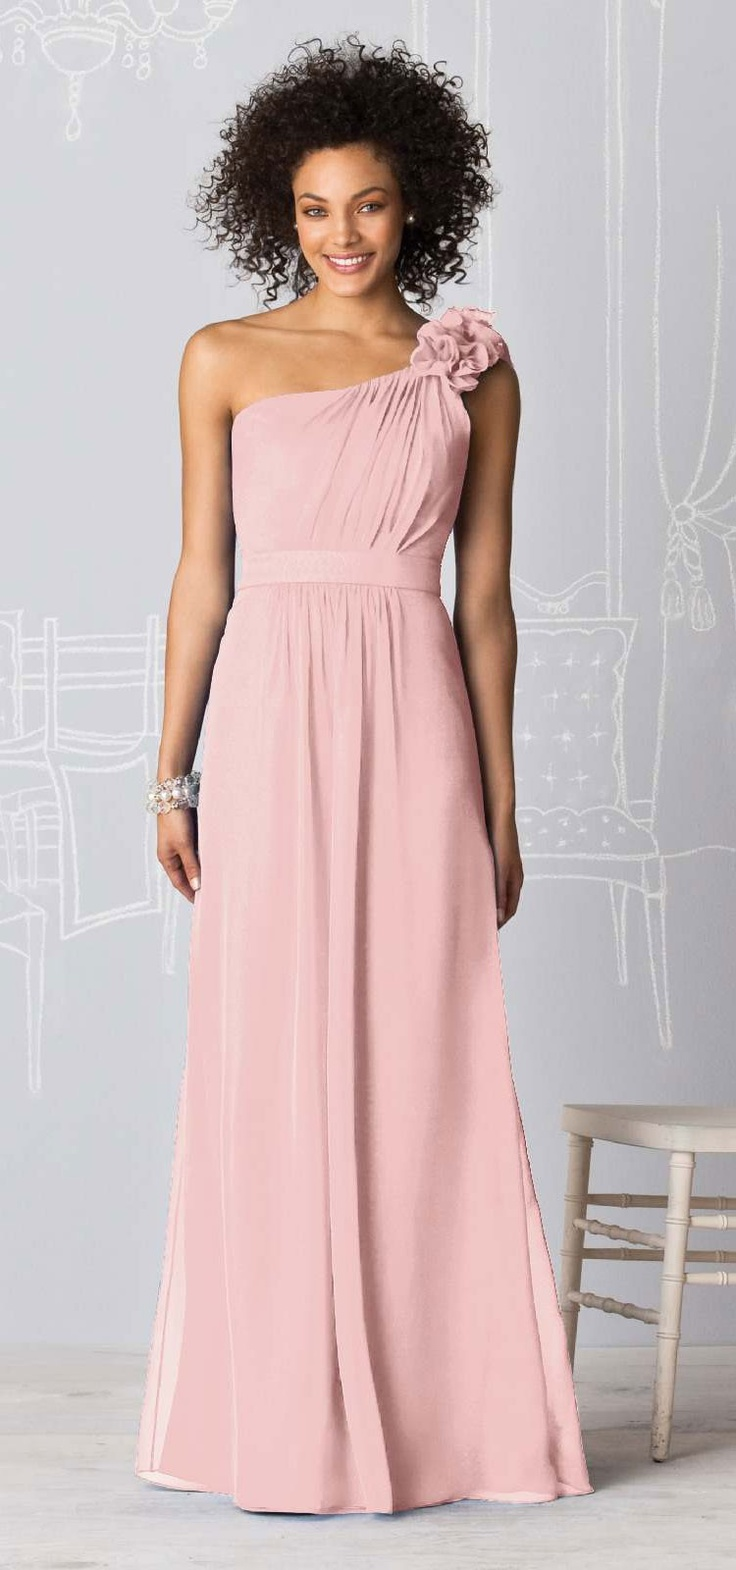 40 best Bridesmaid dresses images on Pinterest | Bridesmade dresses ...